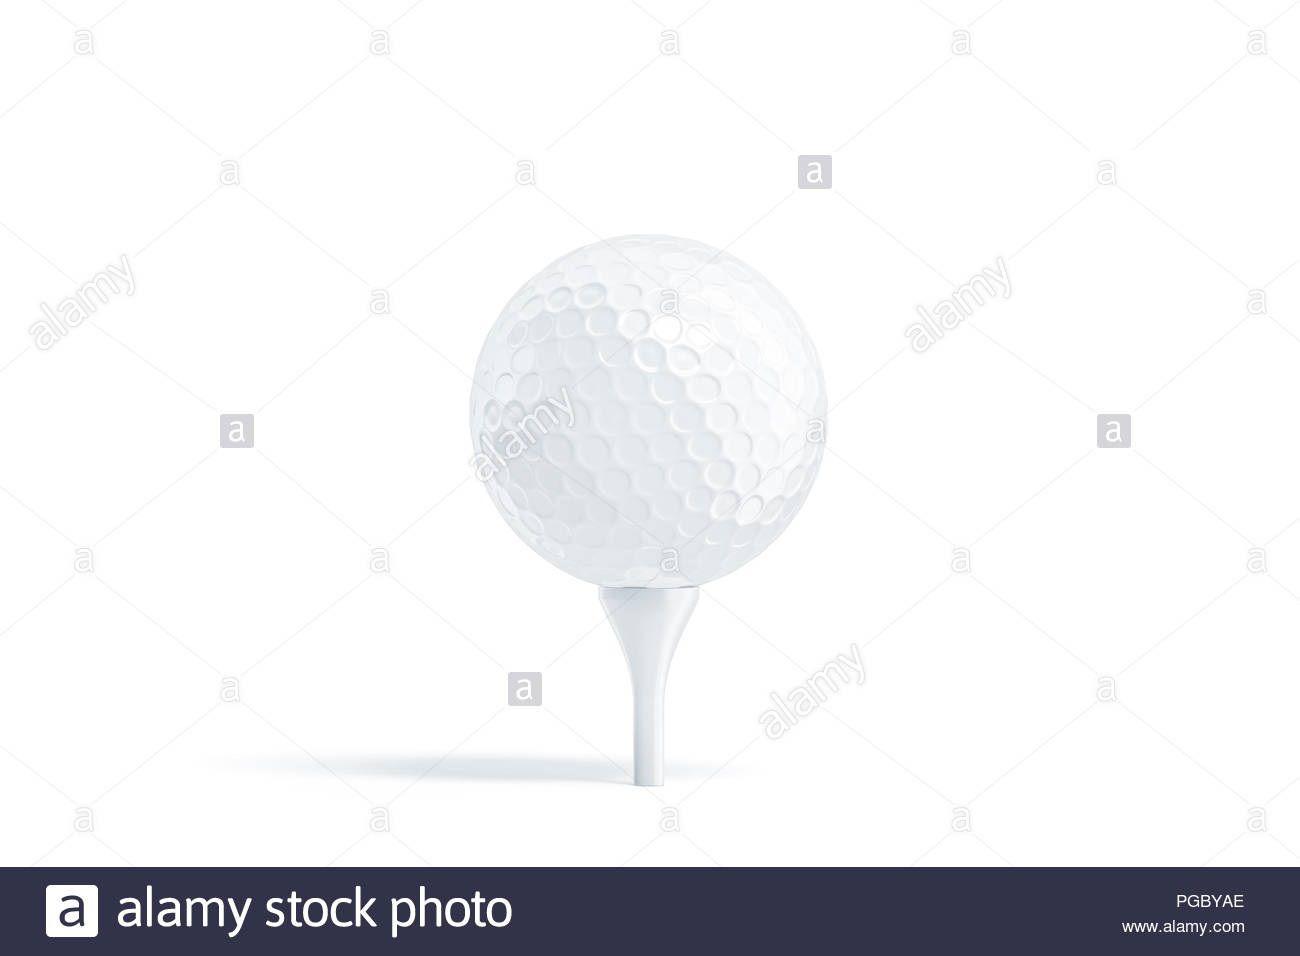 003 Phenomenal Golf Tee Game Template High Resolution  TriangleFull